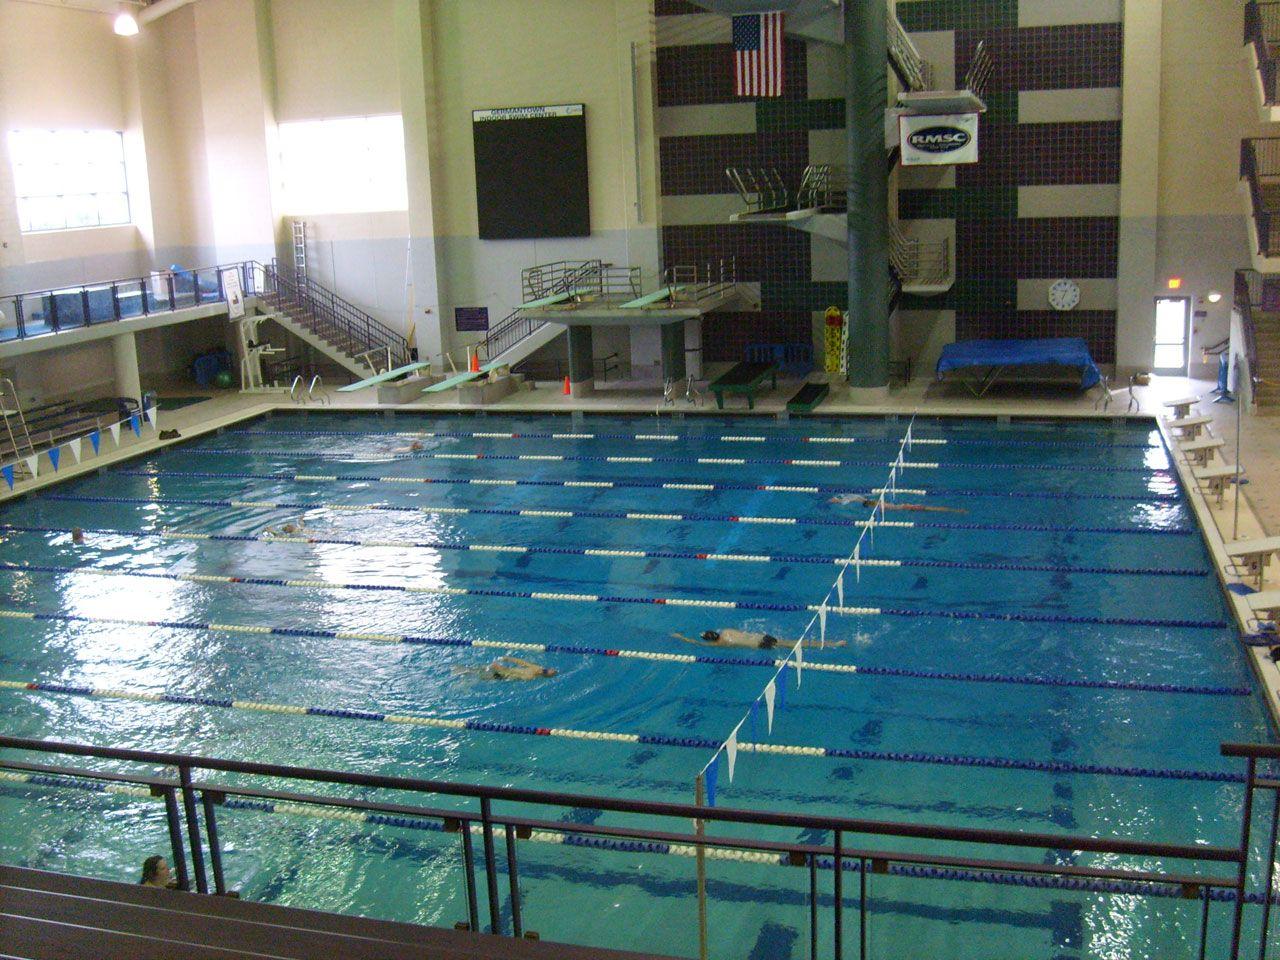 Best Challenging Swimming Pool Wallpaper Download Free Swimming Pools Cool Swimming Pools Pool Houses Download wallpaper swimming pool on